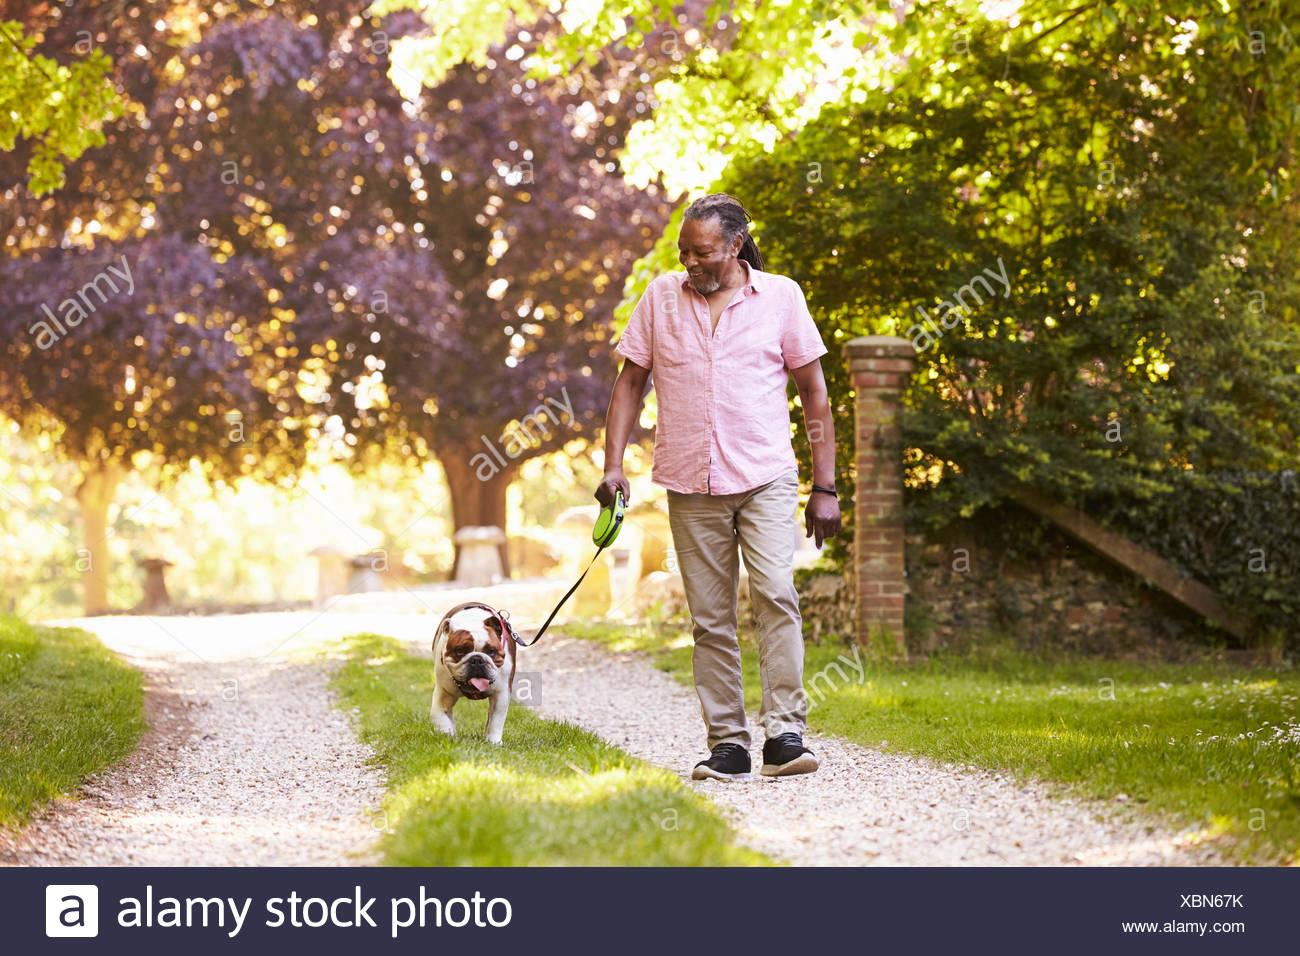 Älterer Mann mit pet-Bulldog in der Landschaft Stockbild